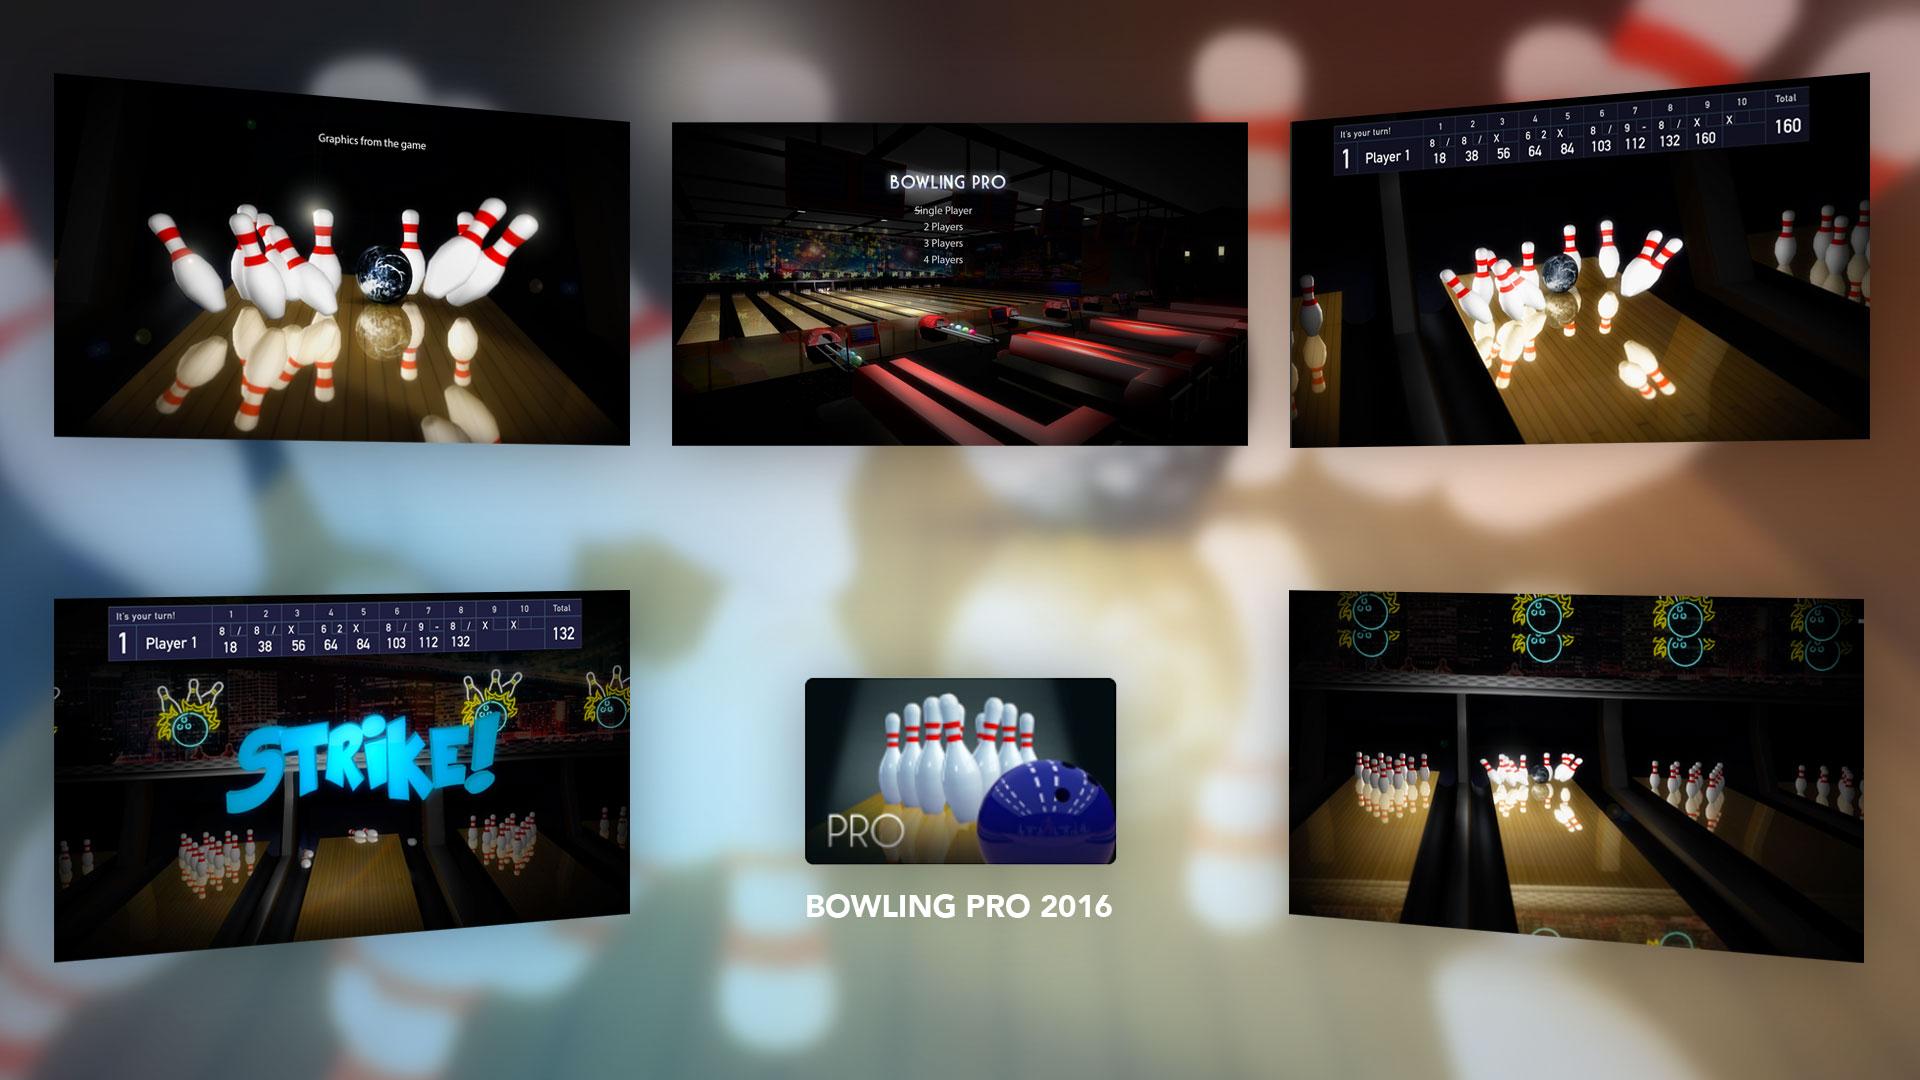 Sports Pro - Golf Tennis Bowling Pool screenshot 5